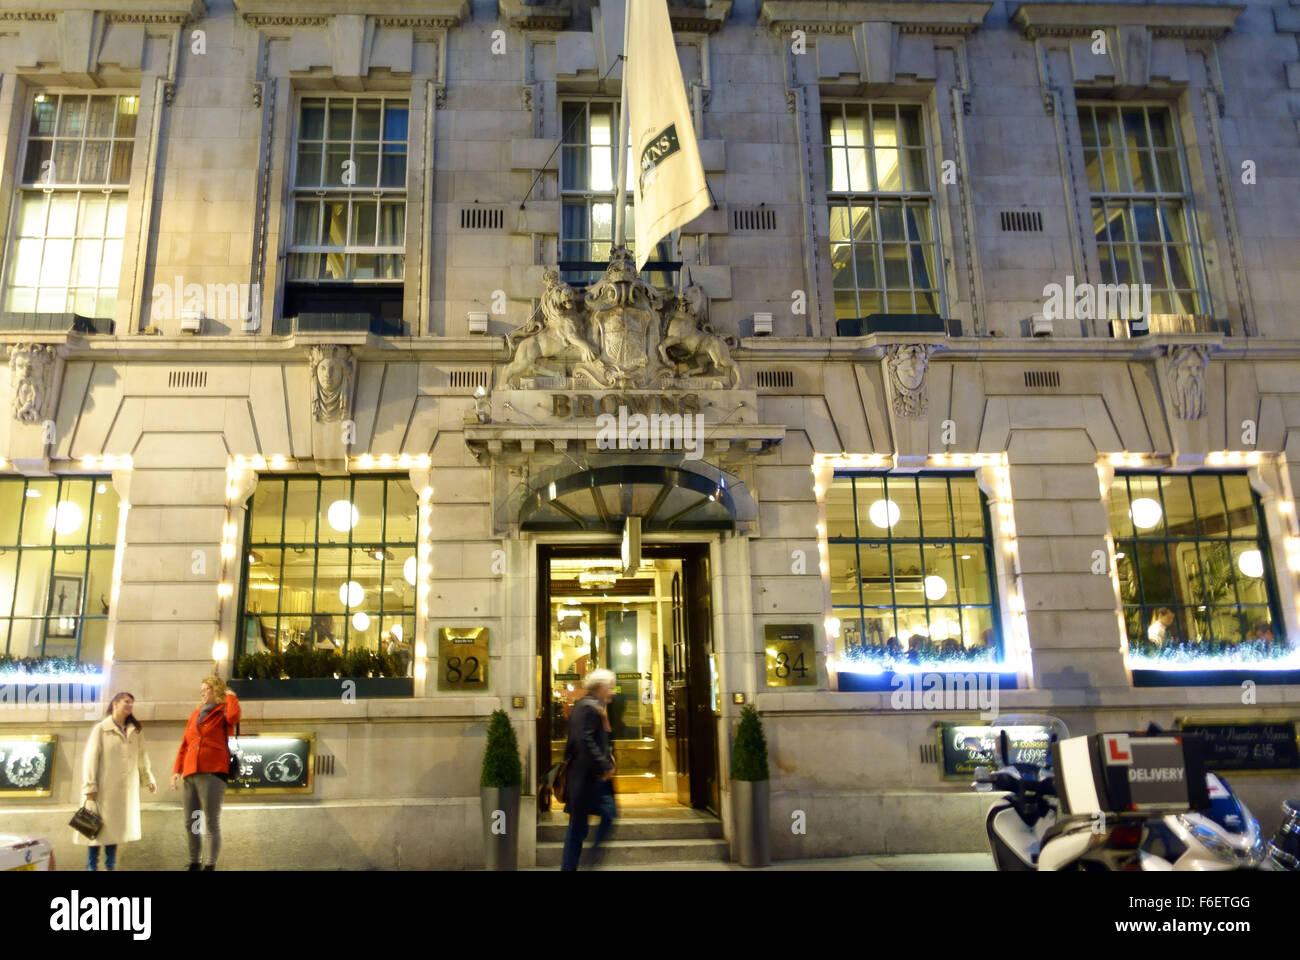 Saint Martin Lane Hotel London